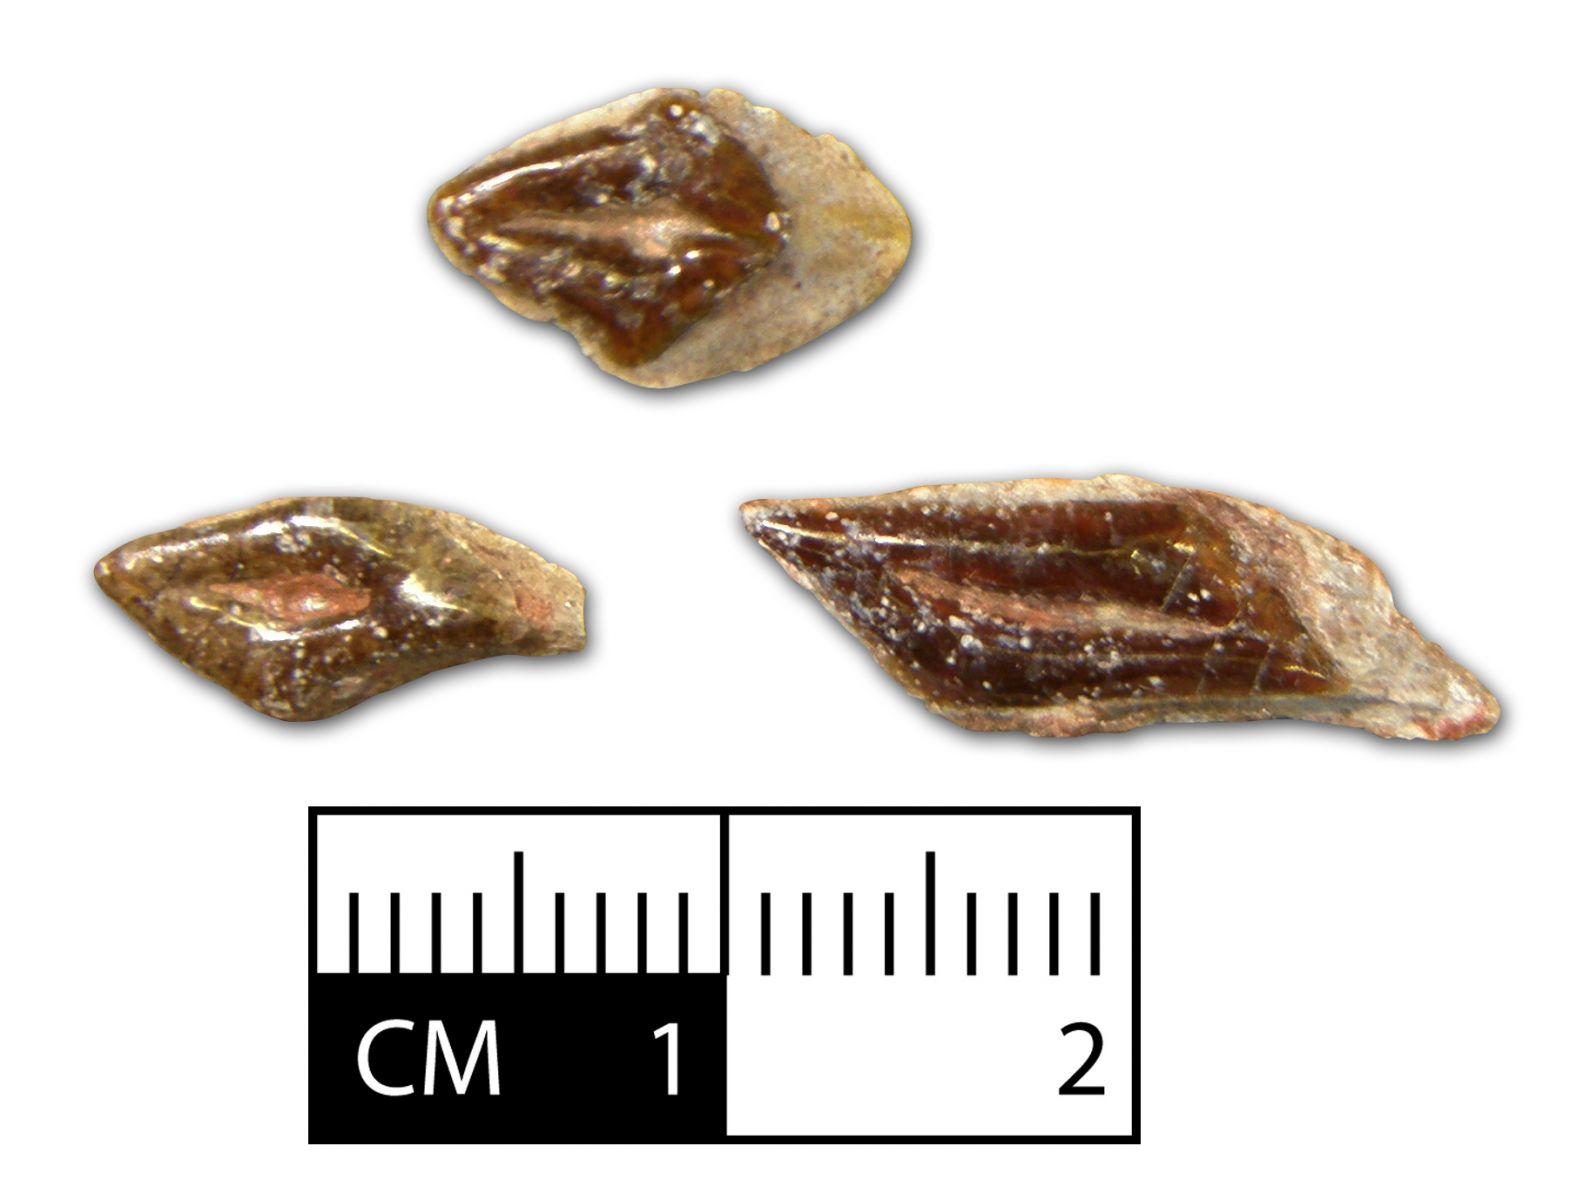 Dentilepisosteus kemkemensis Scales